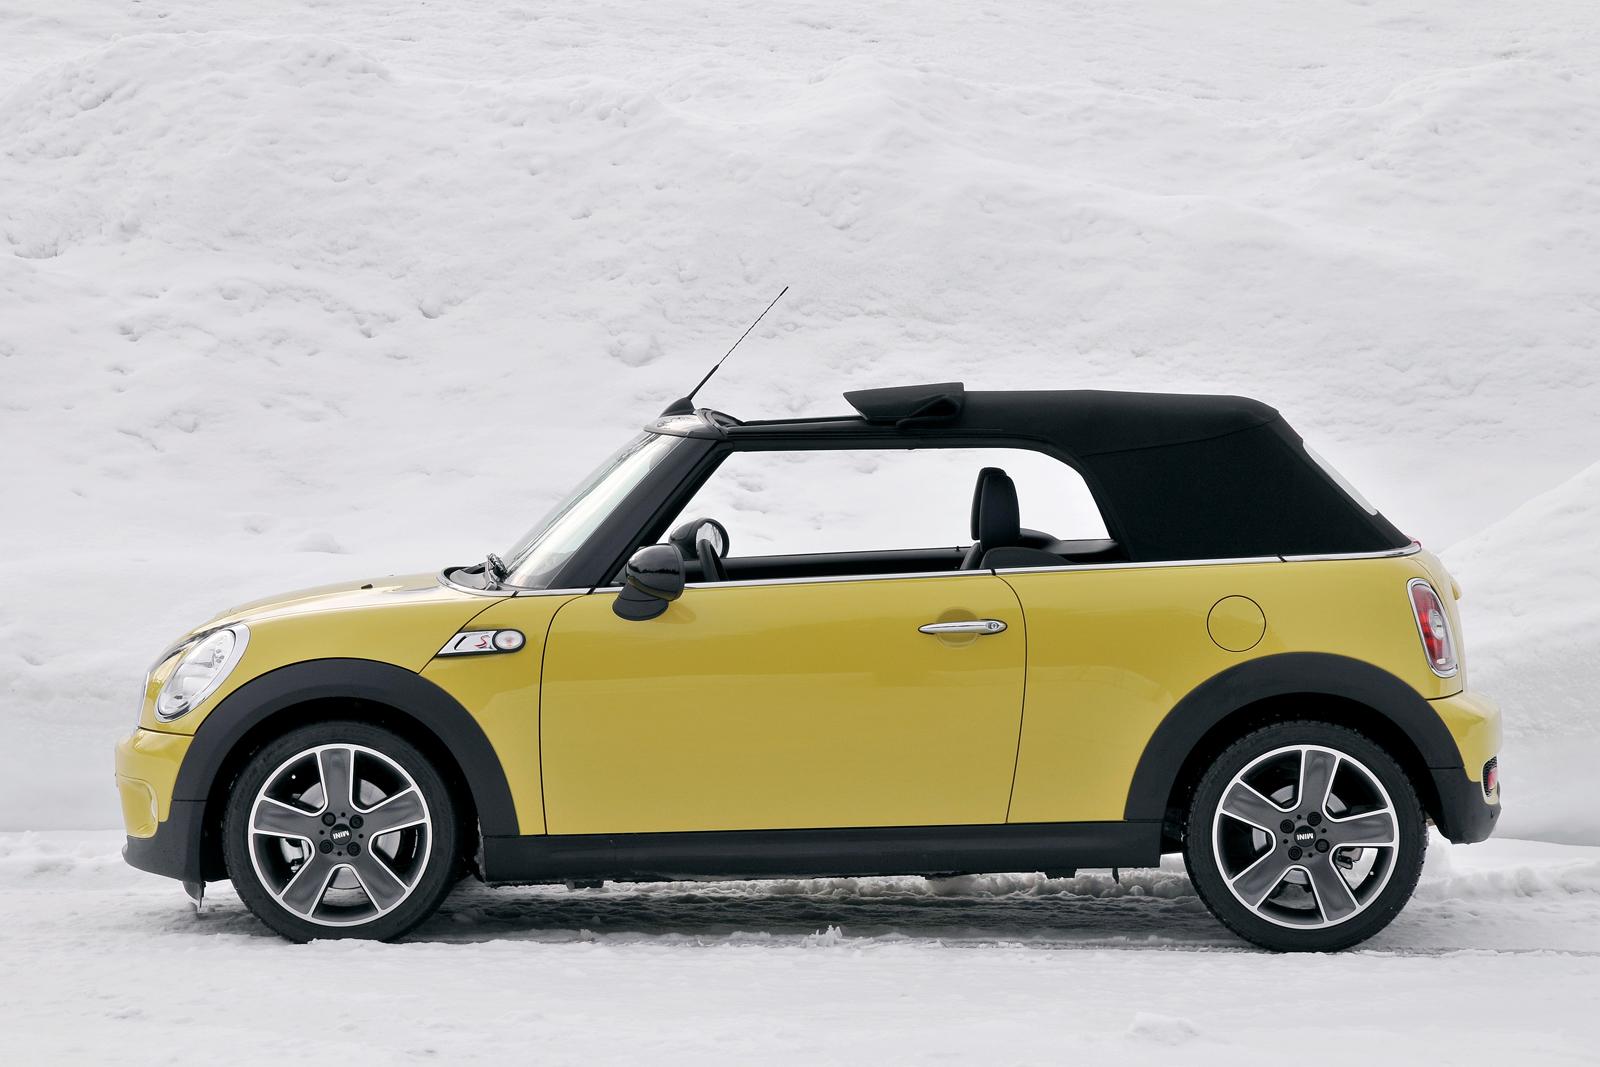 imagini mini cooper s cabrio test in austria. Black Bedroom Furniture Sets. Home Design Ideas